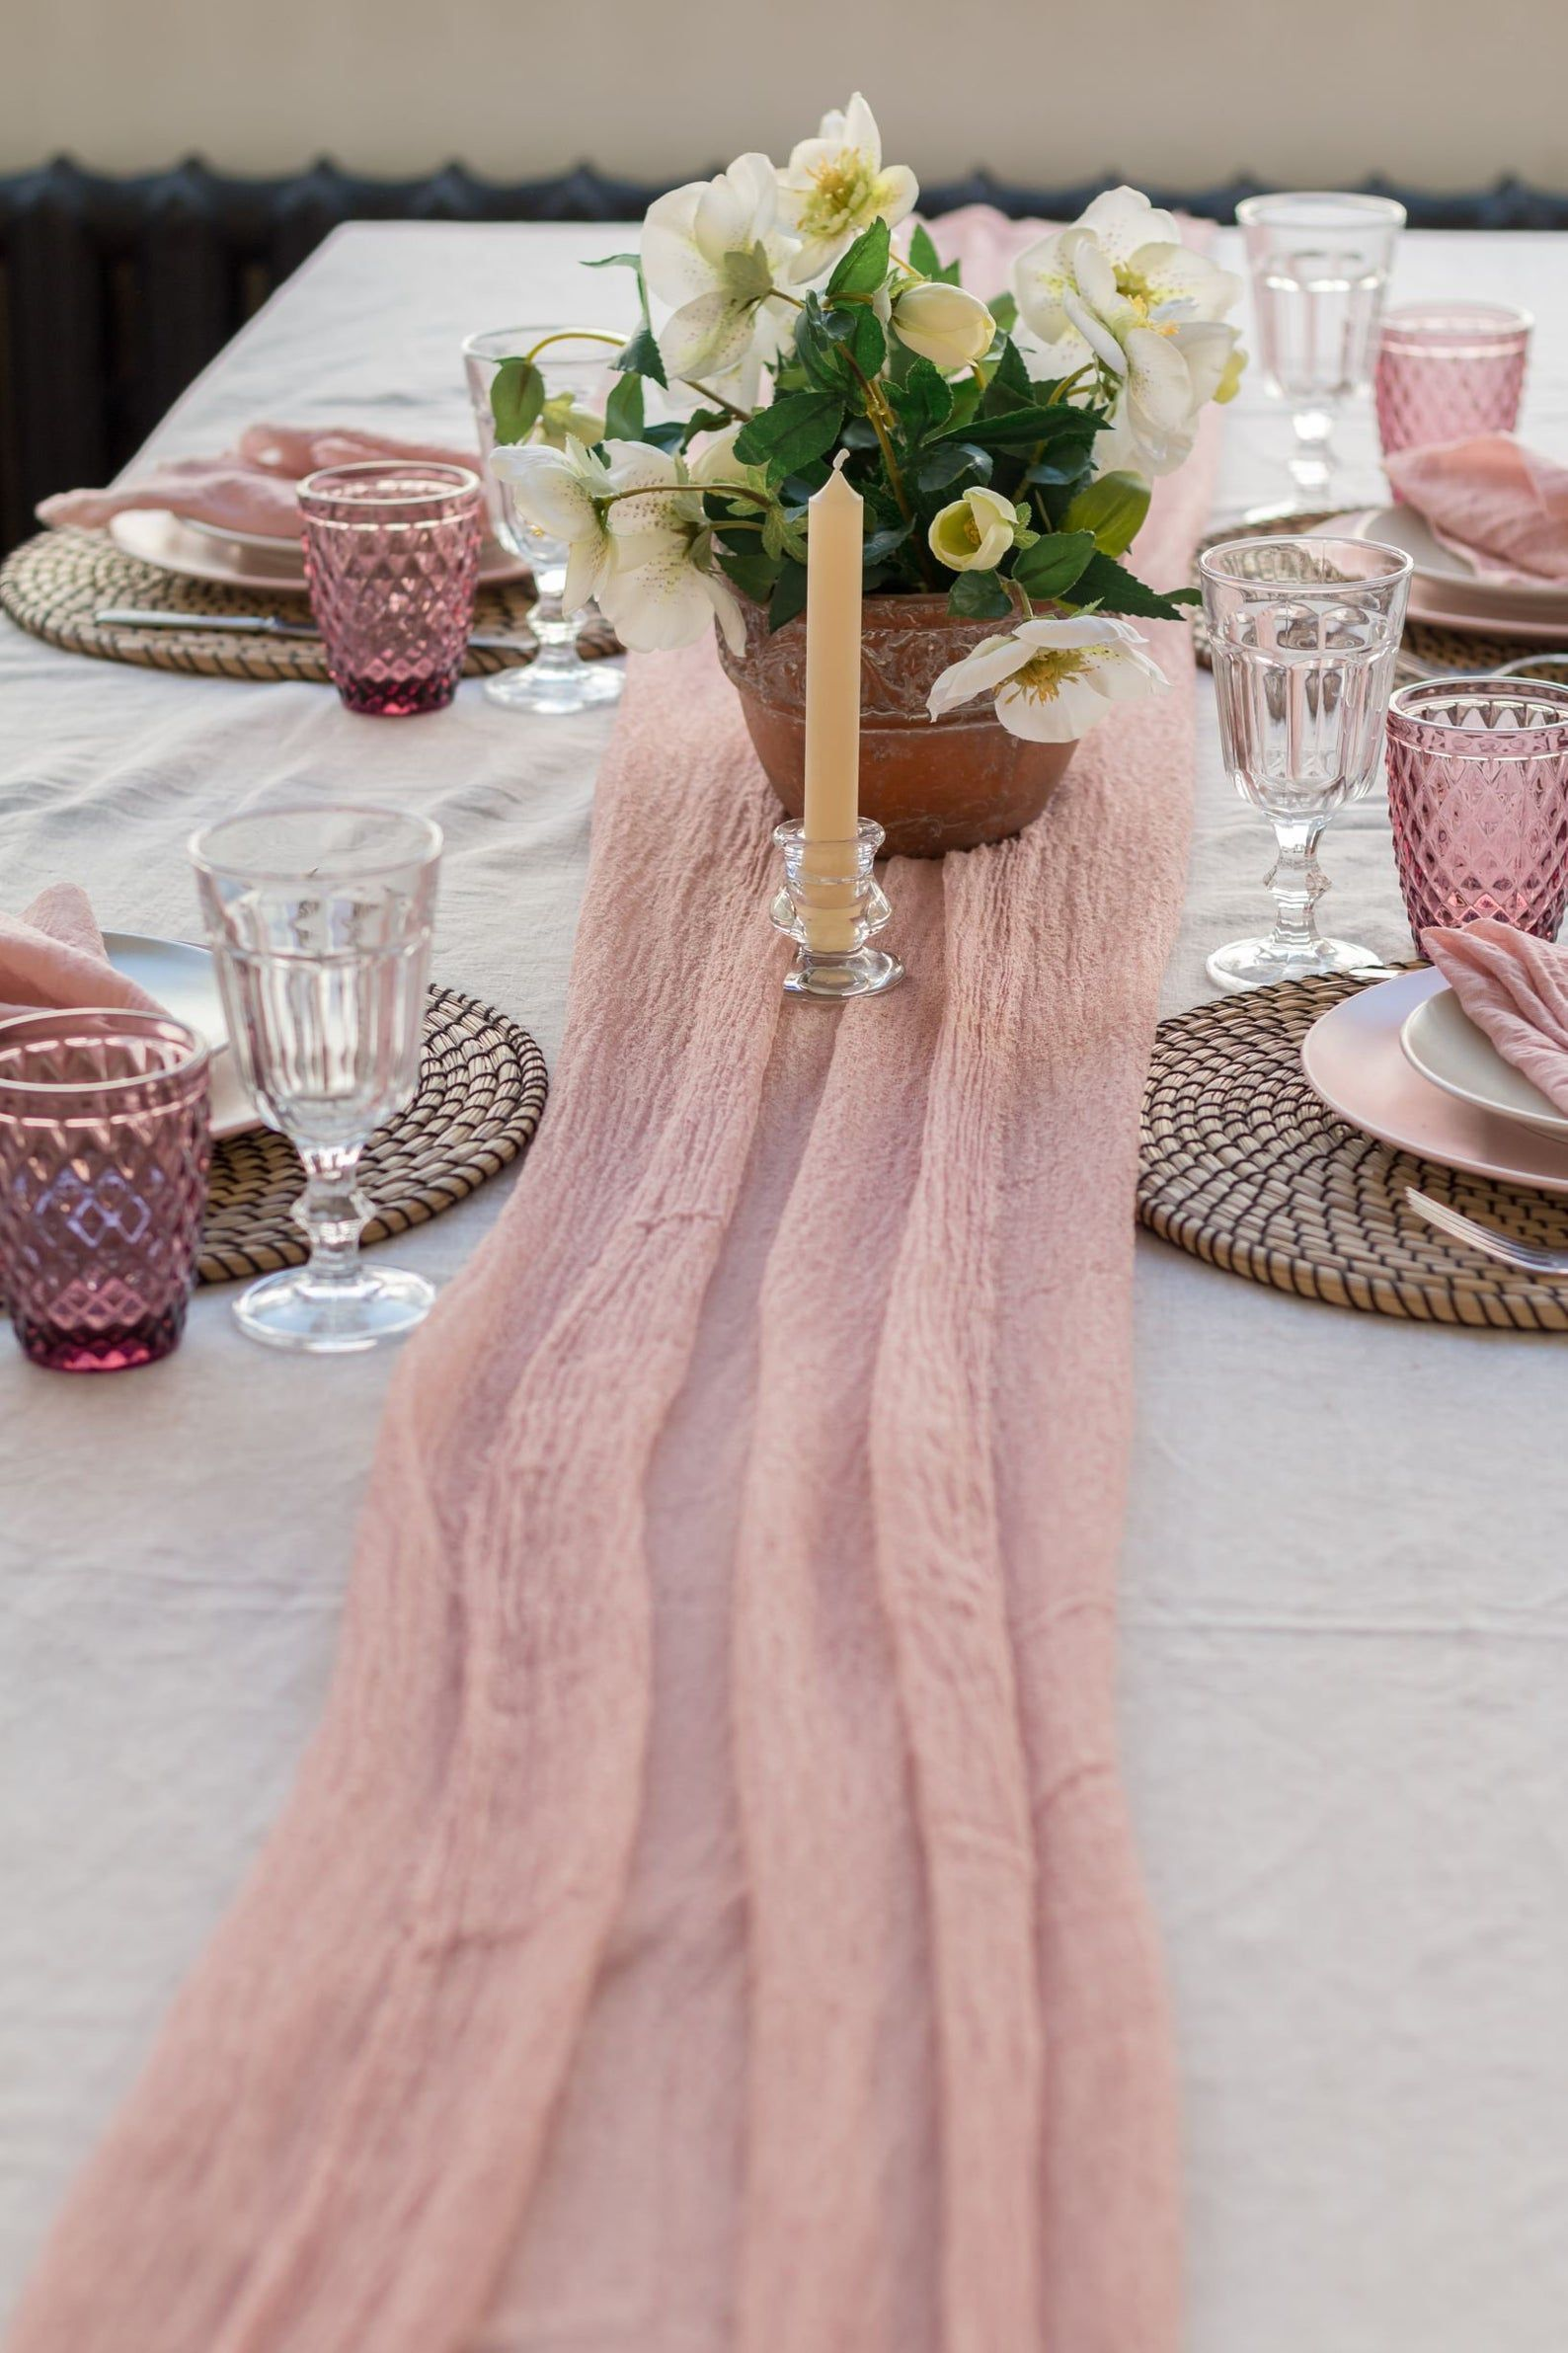 Dusty Rose Gauze Table Runner Table Runner For Wedding Wedding Etsy Table Runners Blush Bridal Showers Rustic Wedding Decor